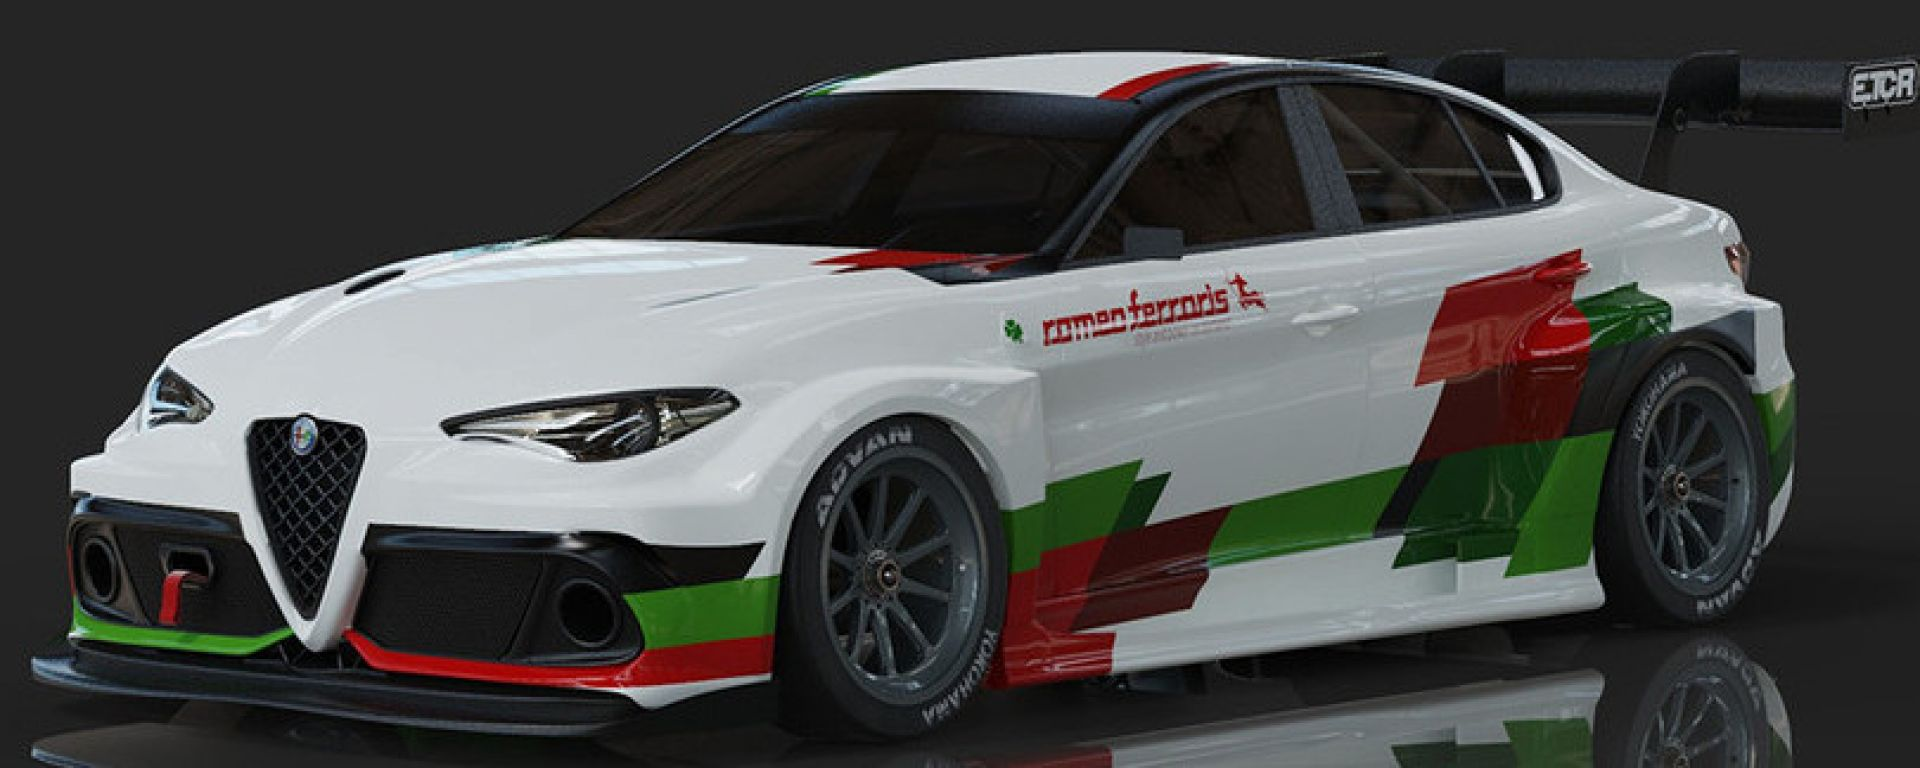 Alfa Romeo Giulia elettrica per l'ETCR, by Romeo Ferraris